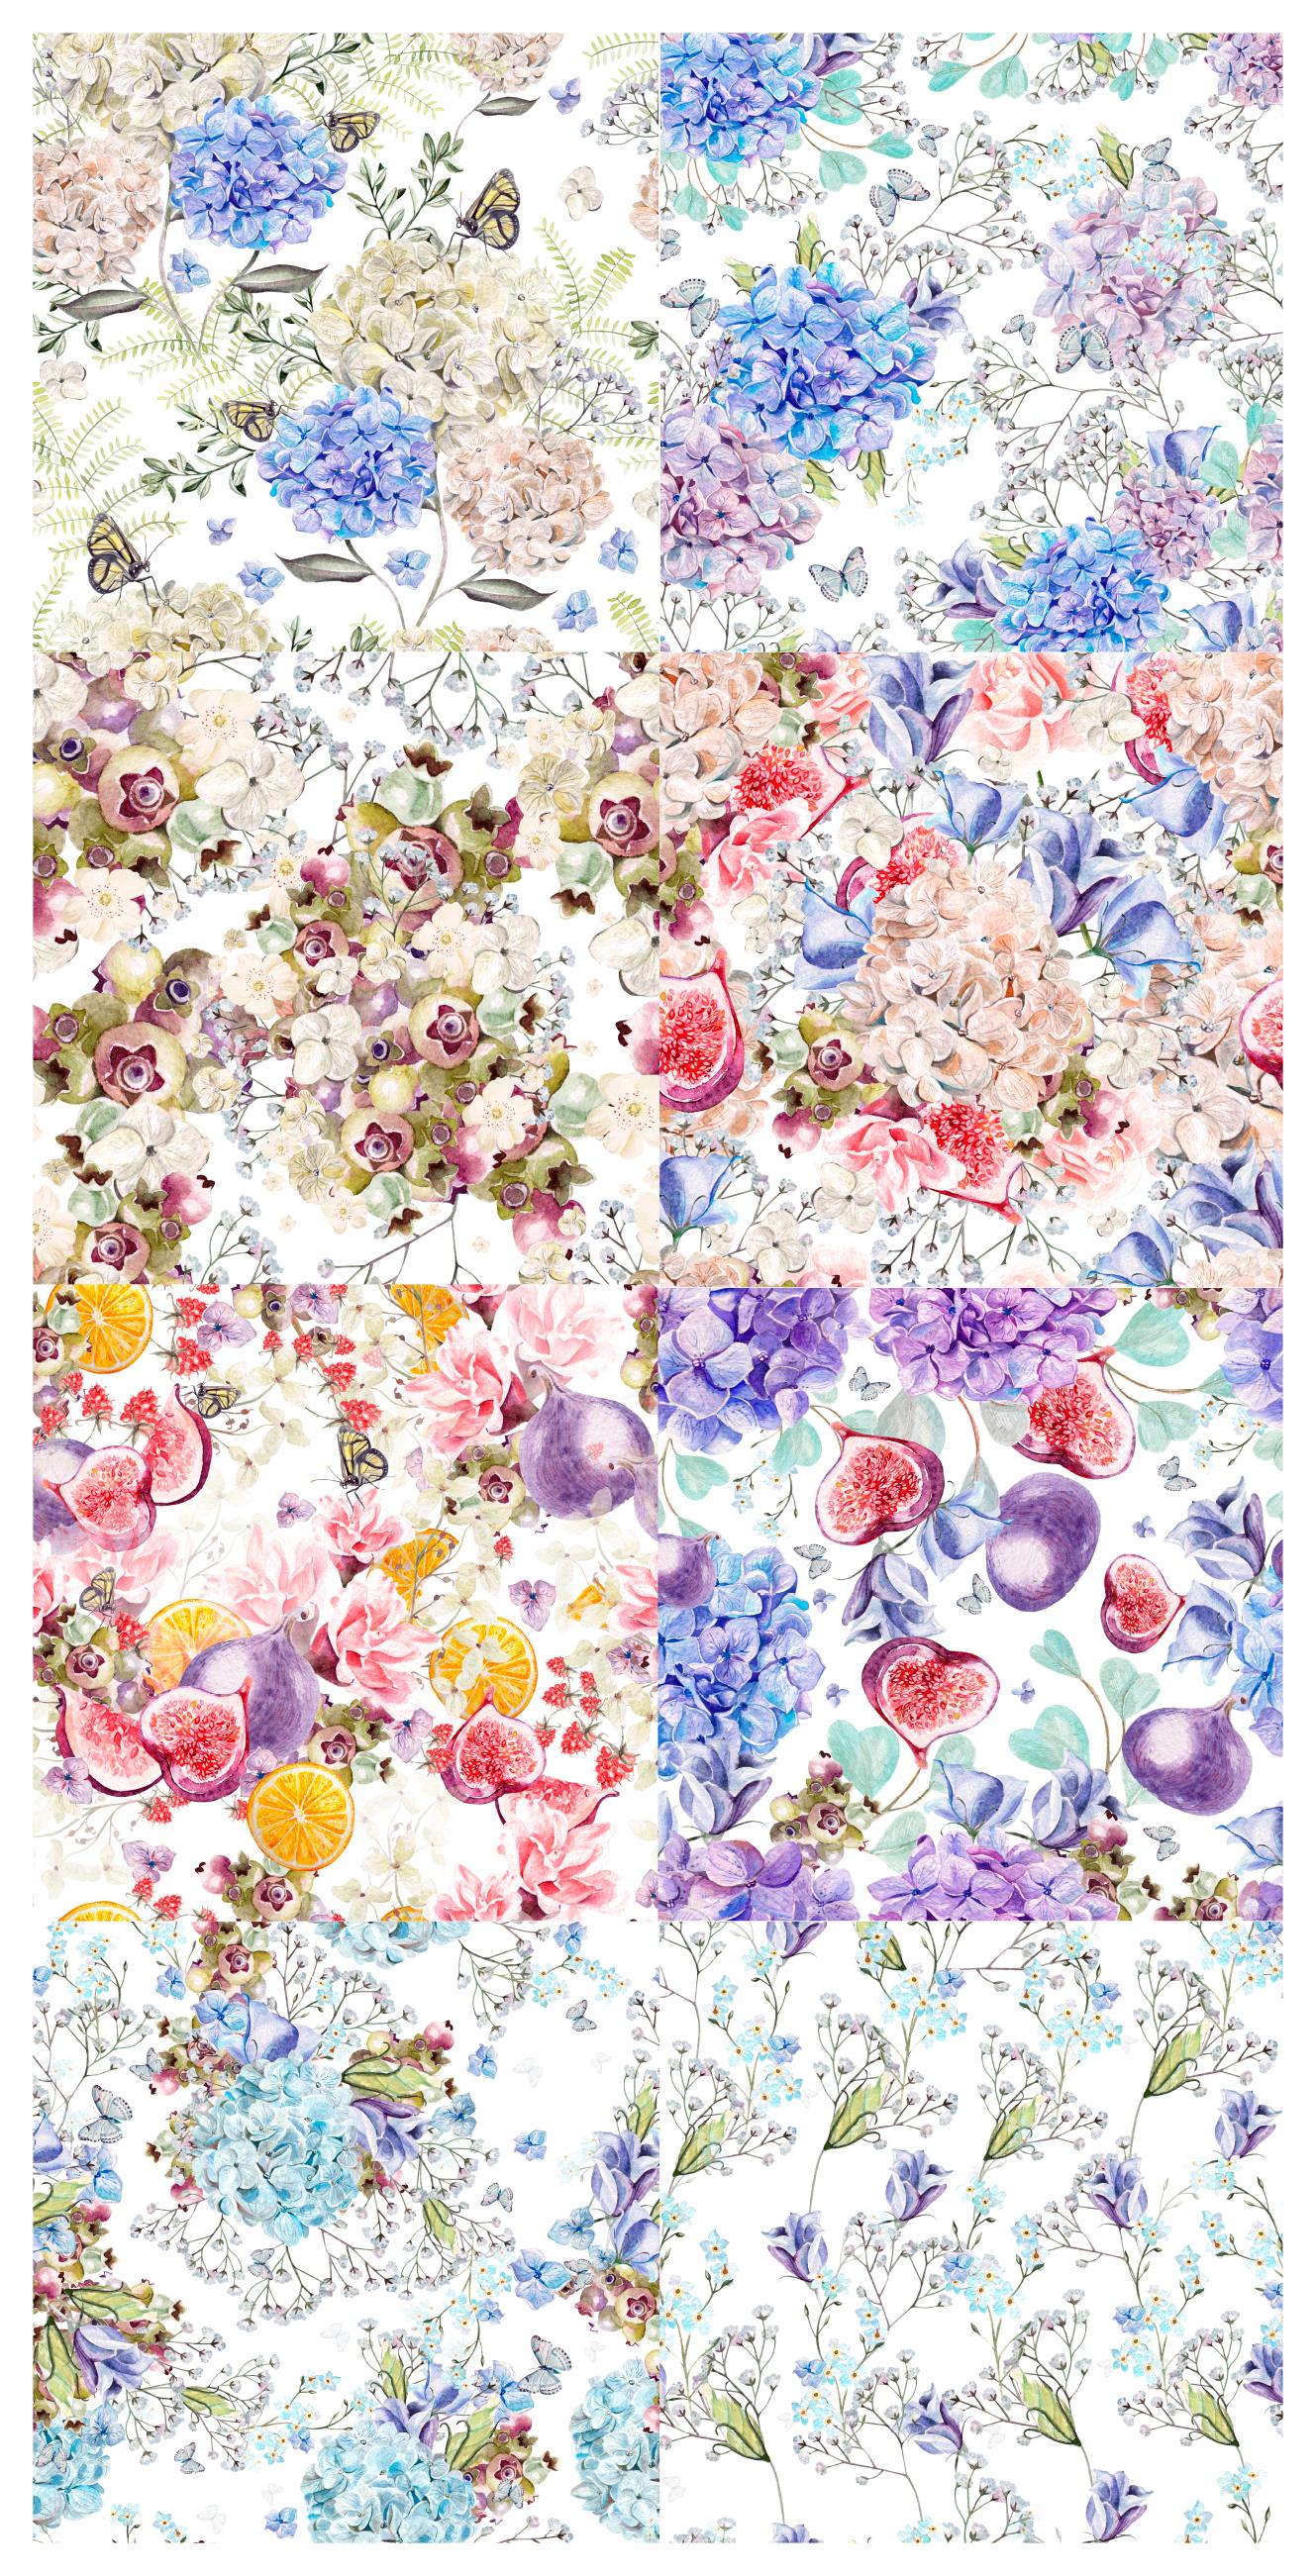 HandDrawn WATERCOLOR Wedding Flowers example image 4